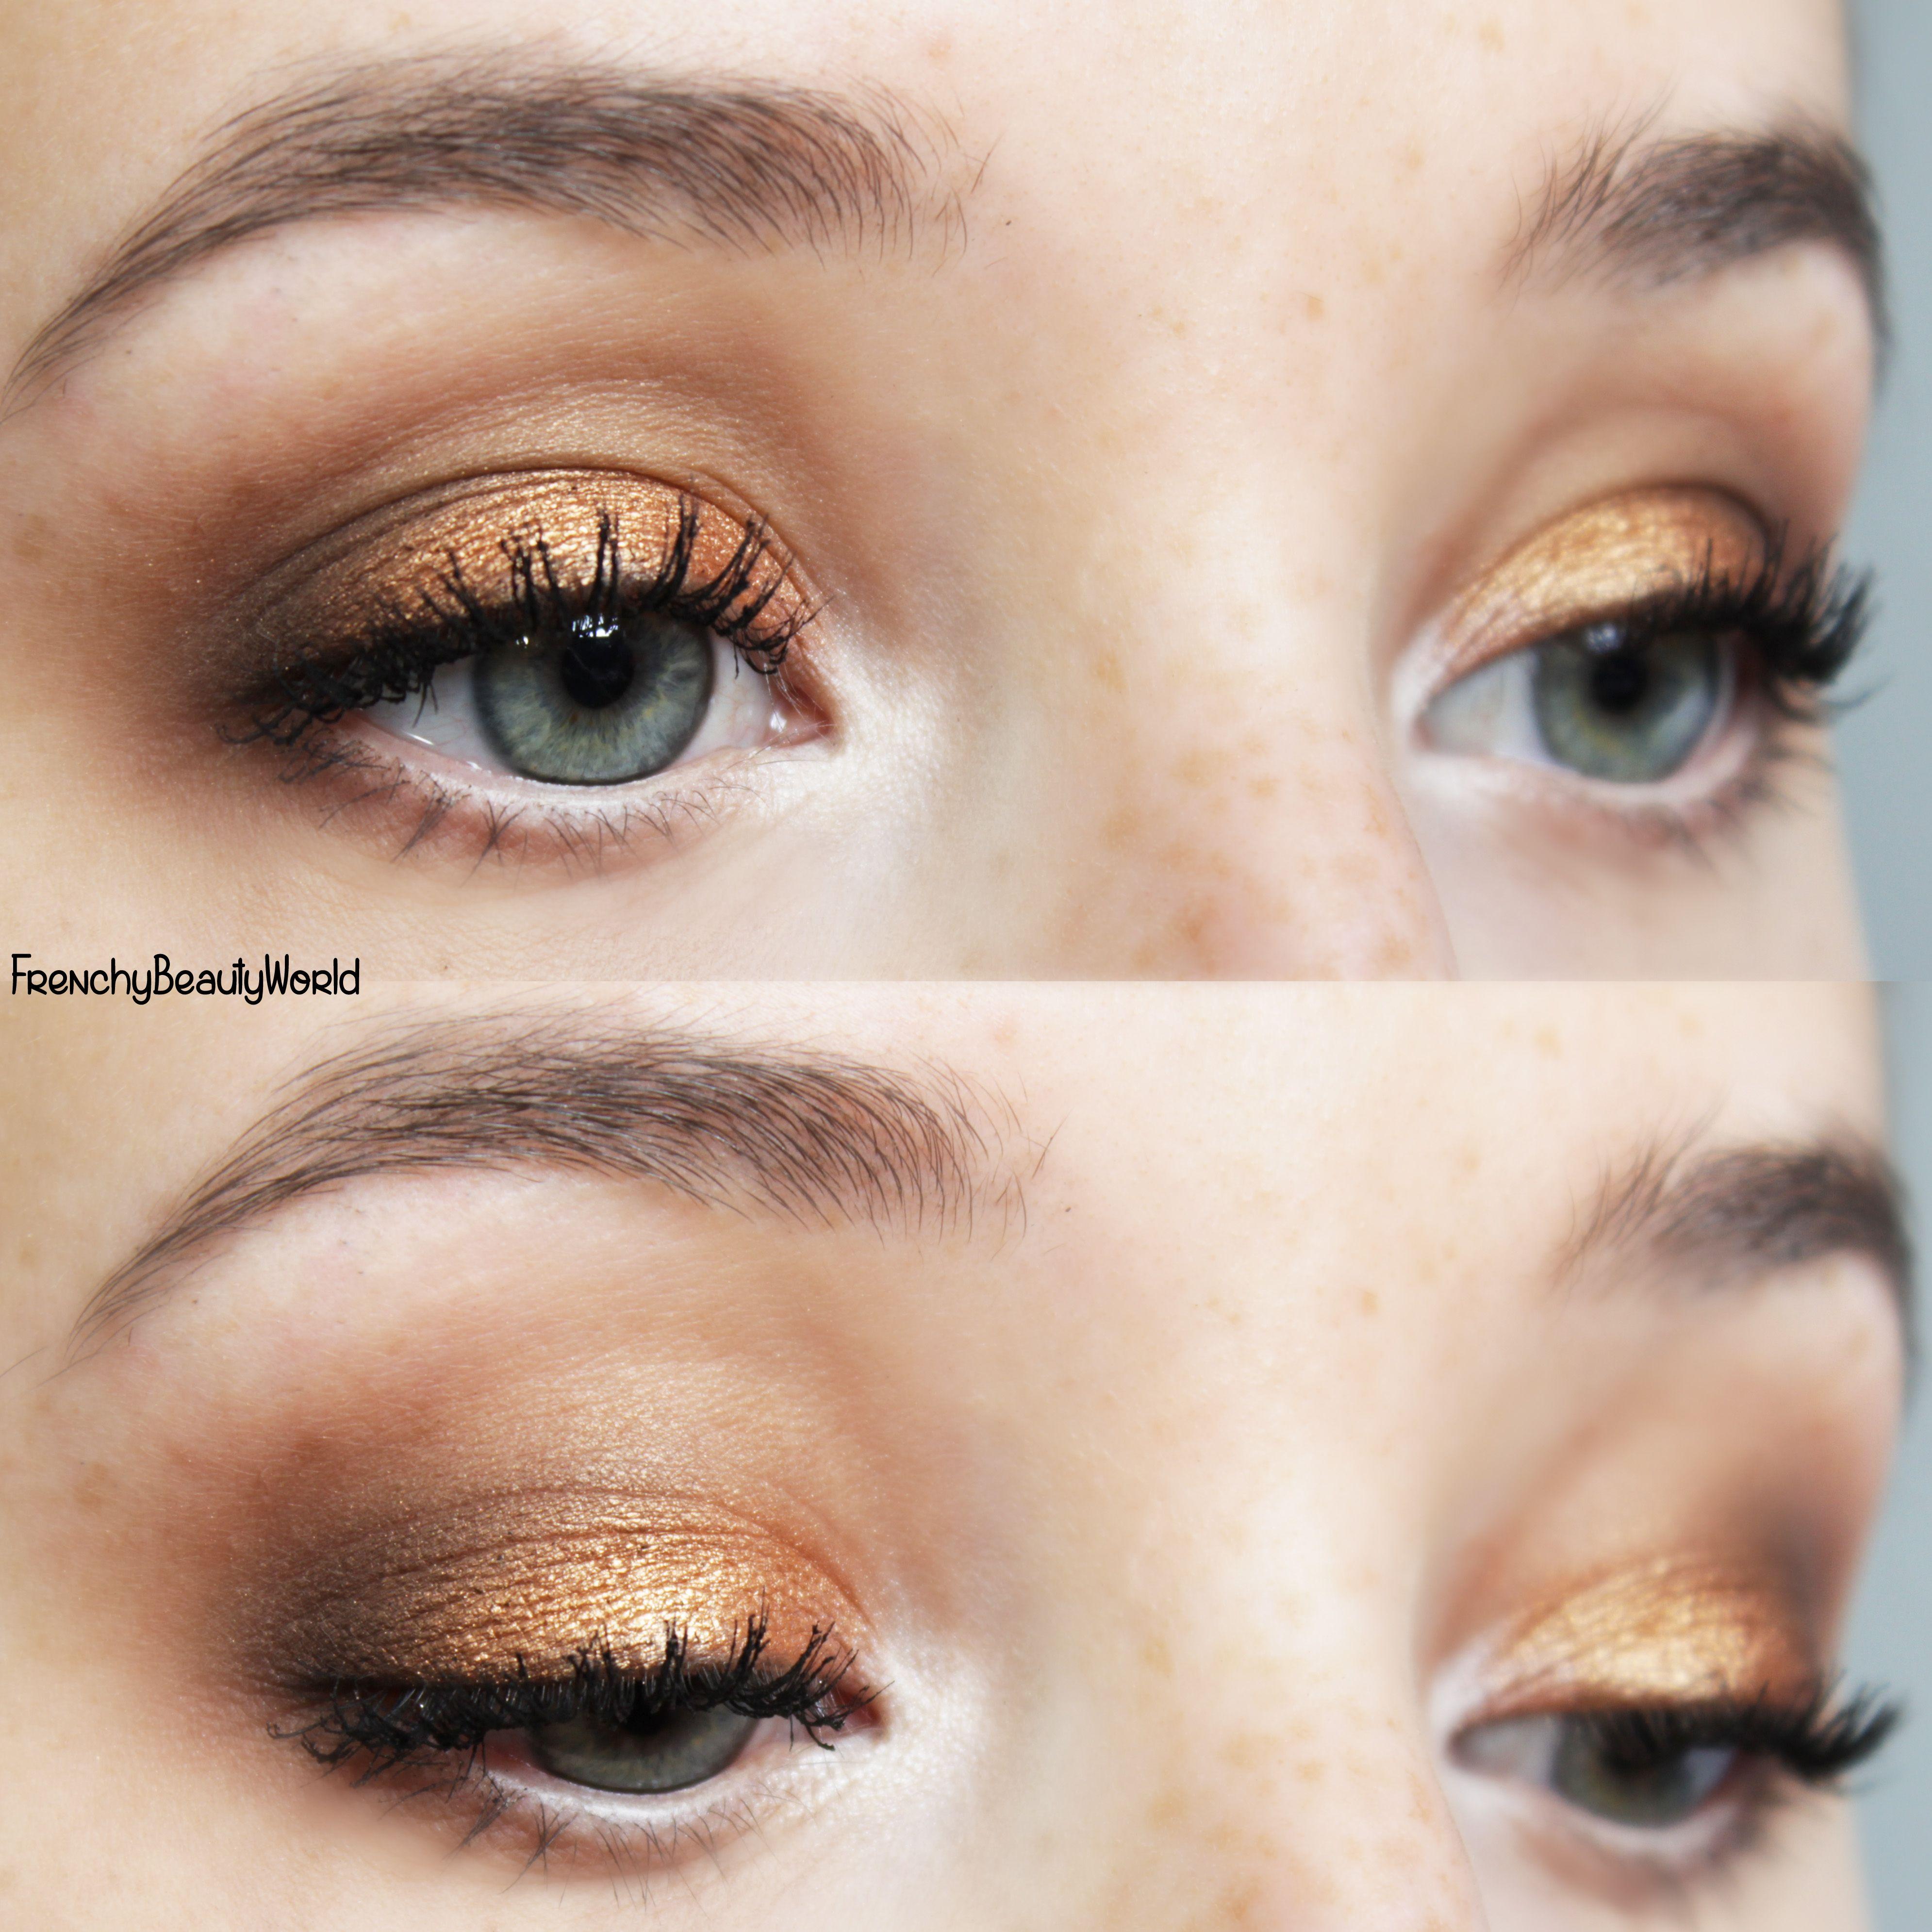 nyx makeup eyebrows. nyx eyelook ❤ makeup ideas brows : benefit cosmetics gimme brow eyeshadows ▷ eyebrows